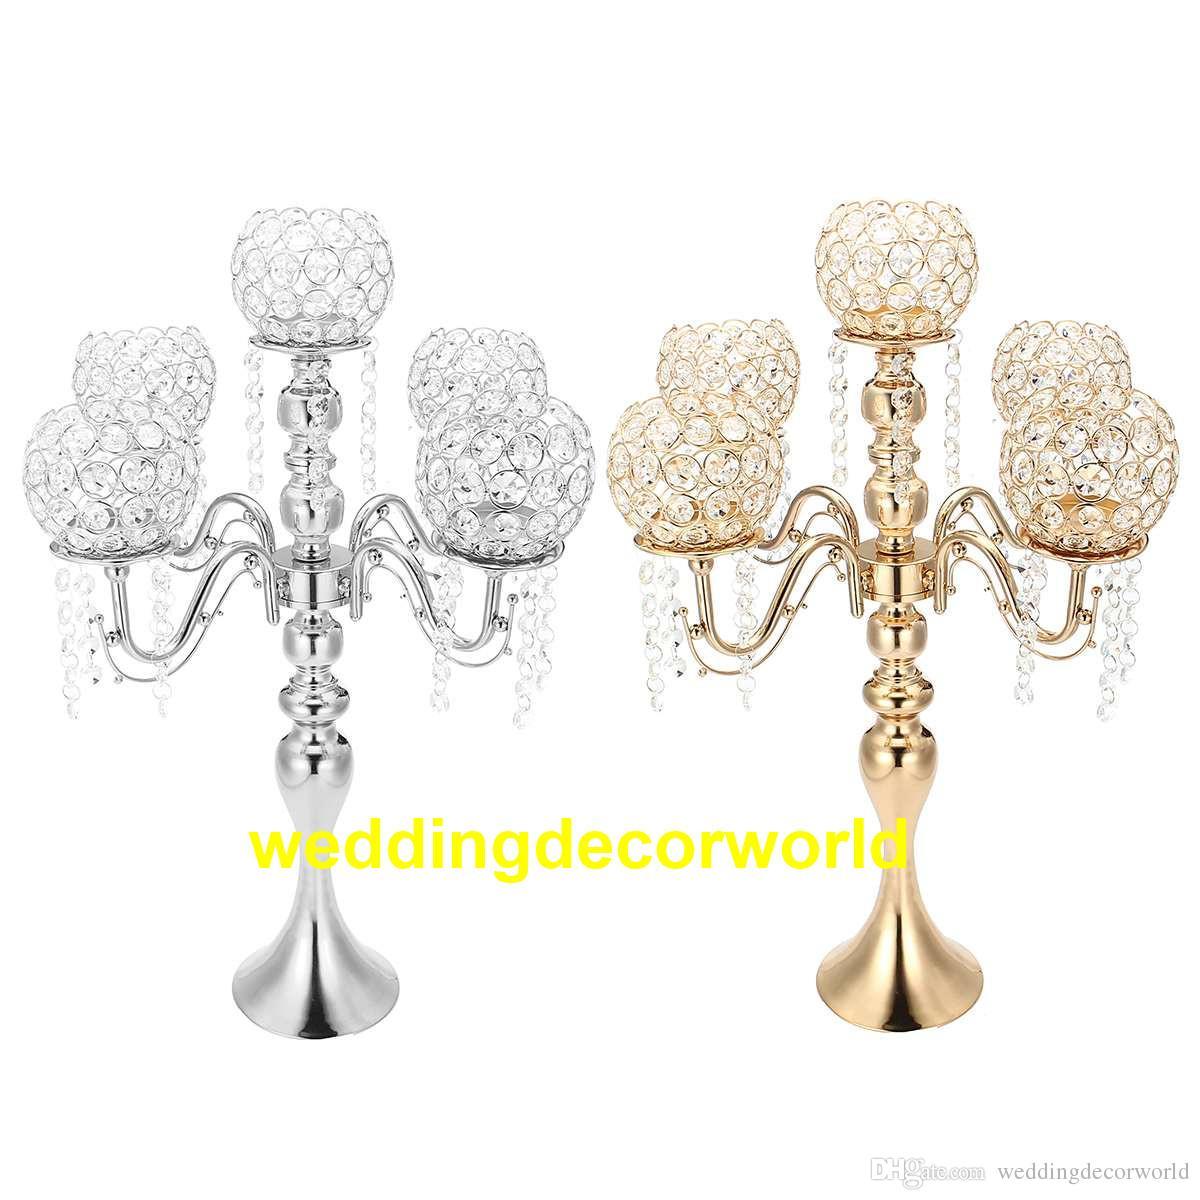 5 arm Crystal Candle Holder Wedding Candelabra Centerpieces Center Table Candlesticks Party Decor Lantern stand Silver/Gold event decor449